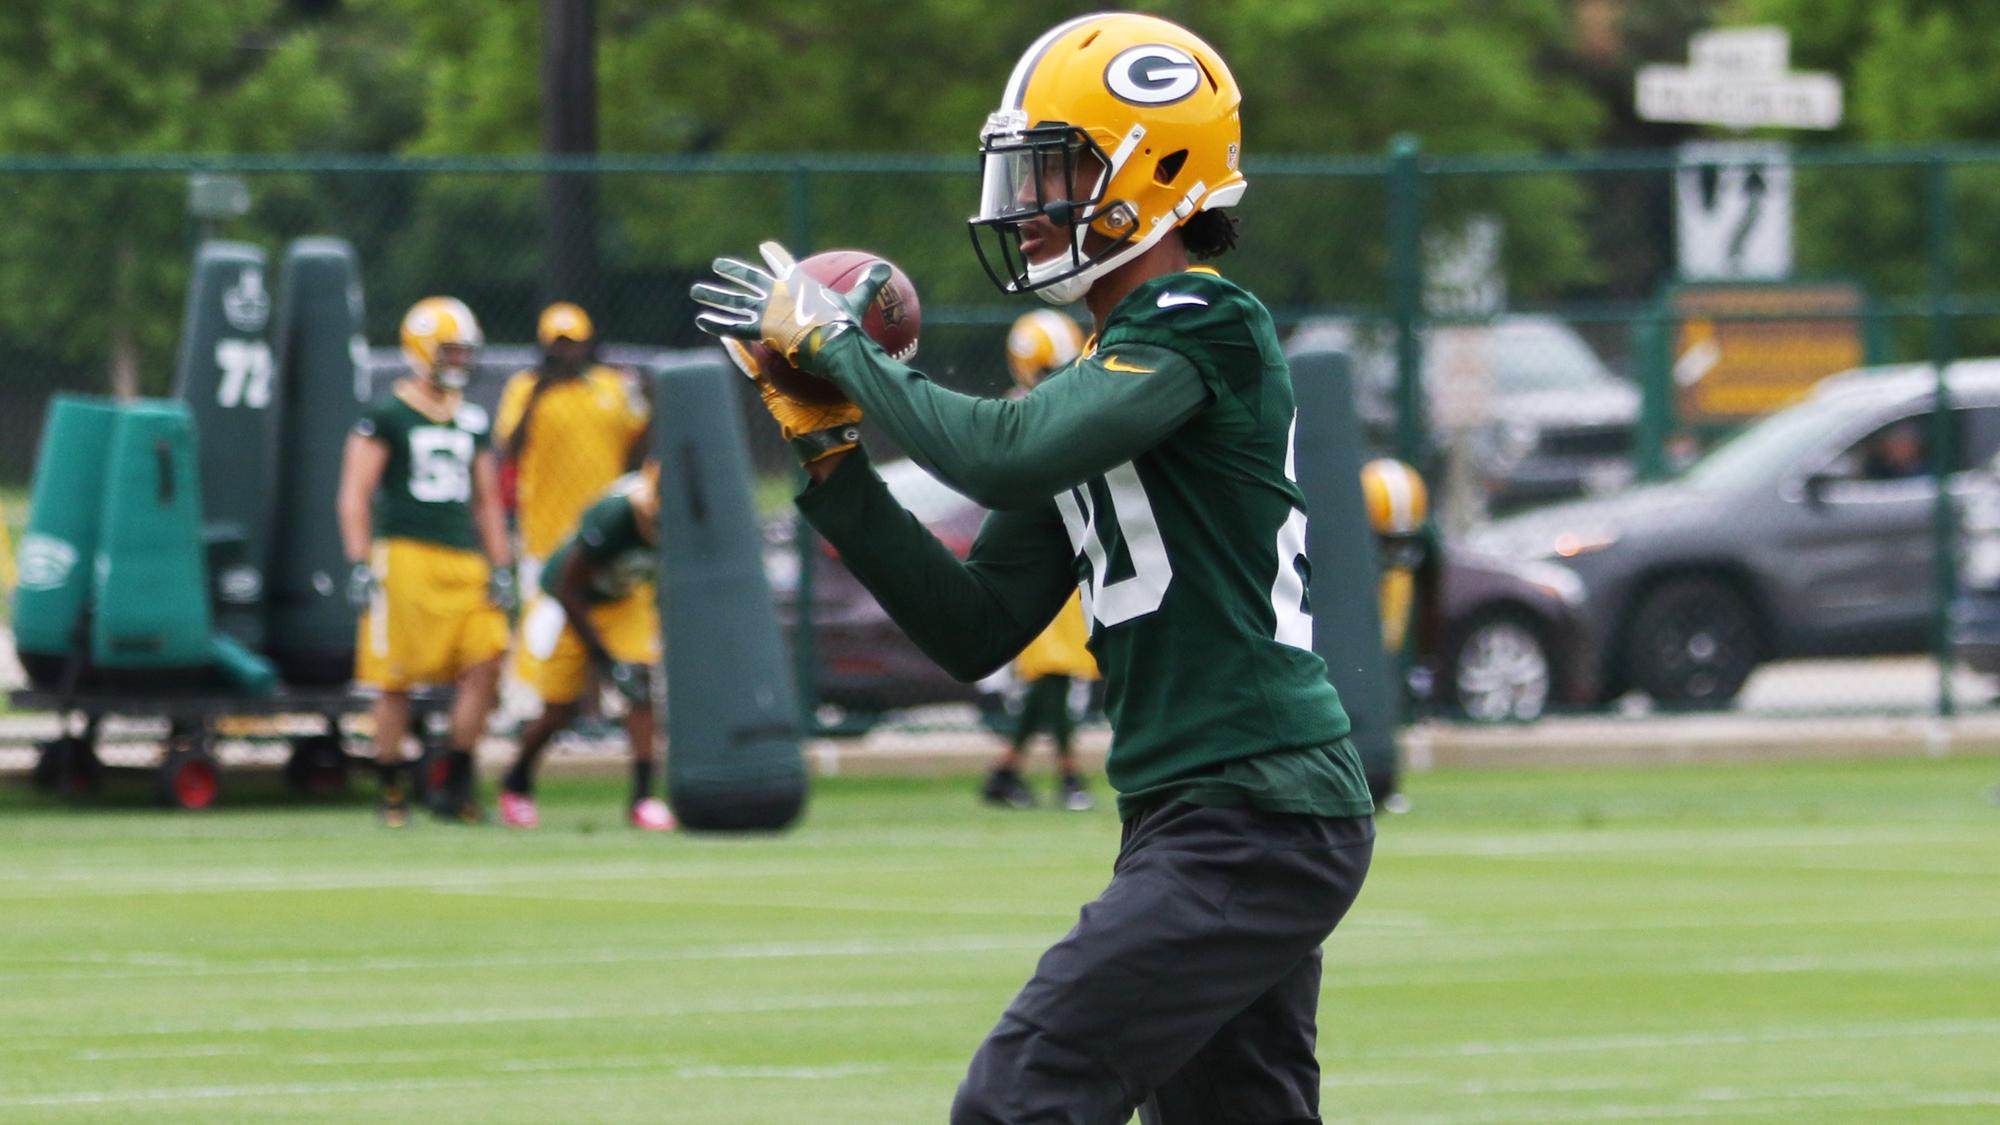 NFL: JUN 13 Packers Minicamp